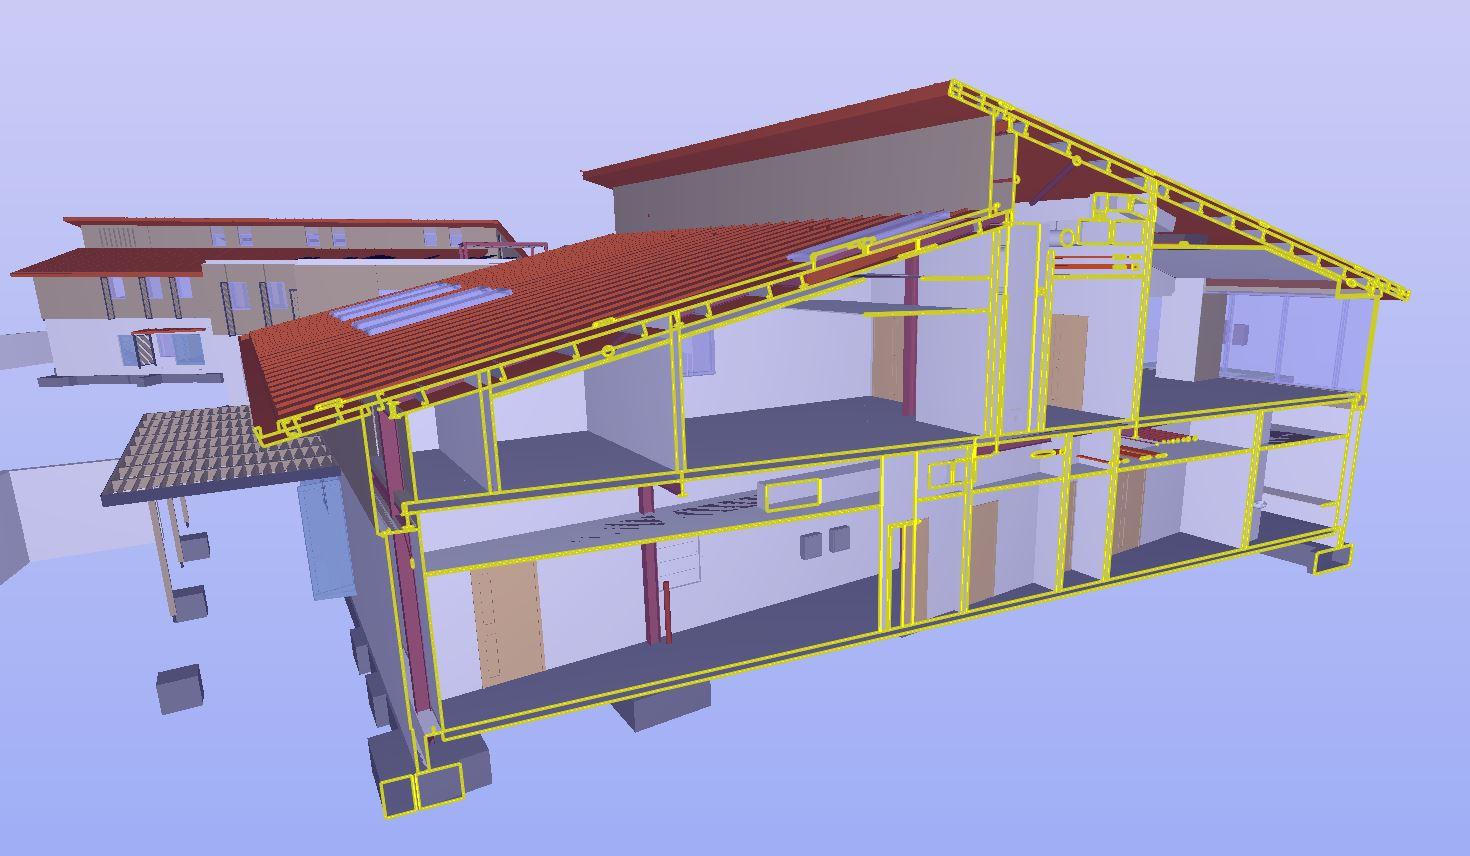 LSI_Architects_Cambridge_Hospice_BIM_02